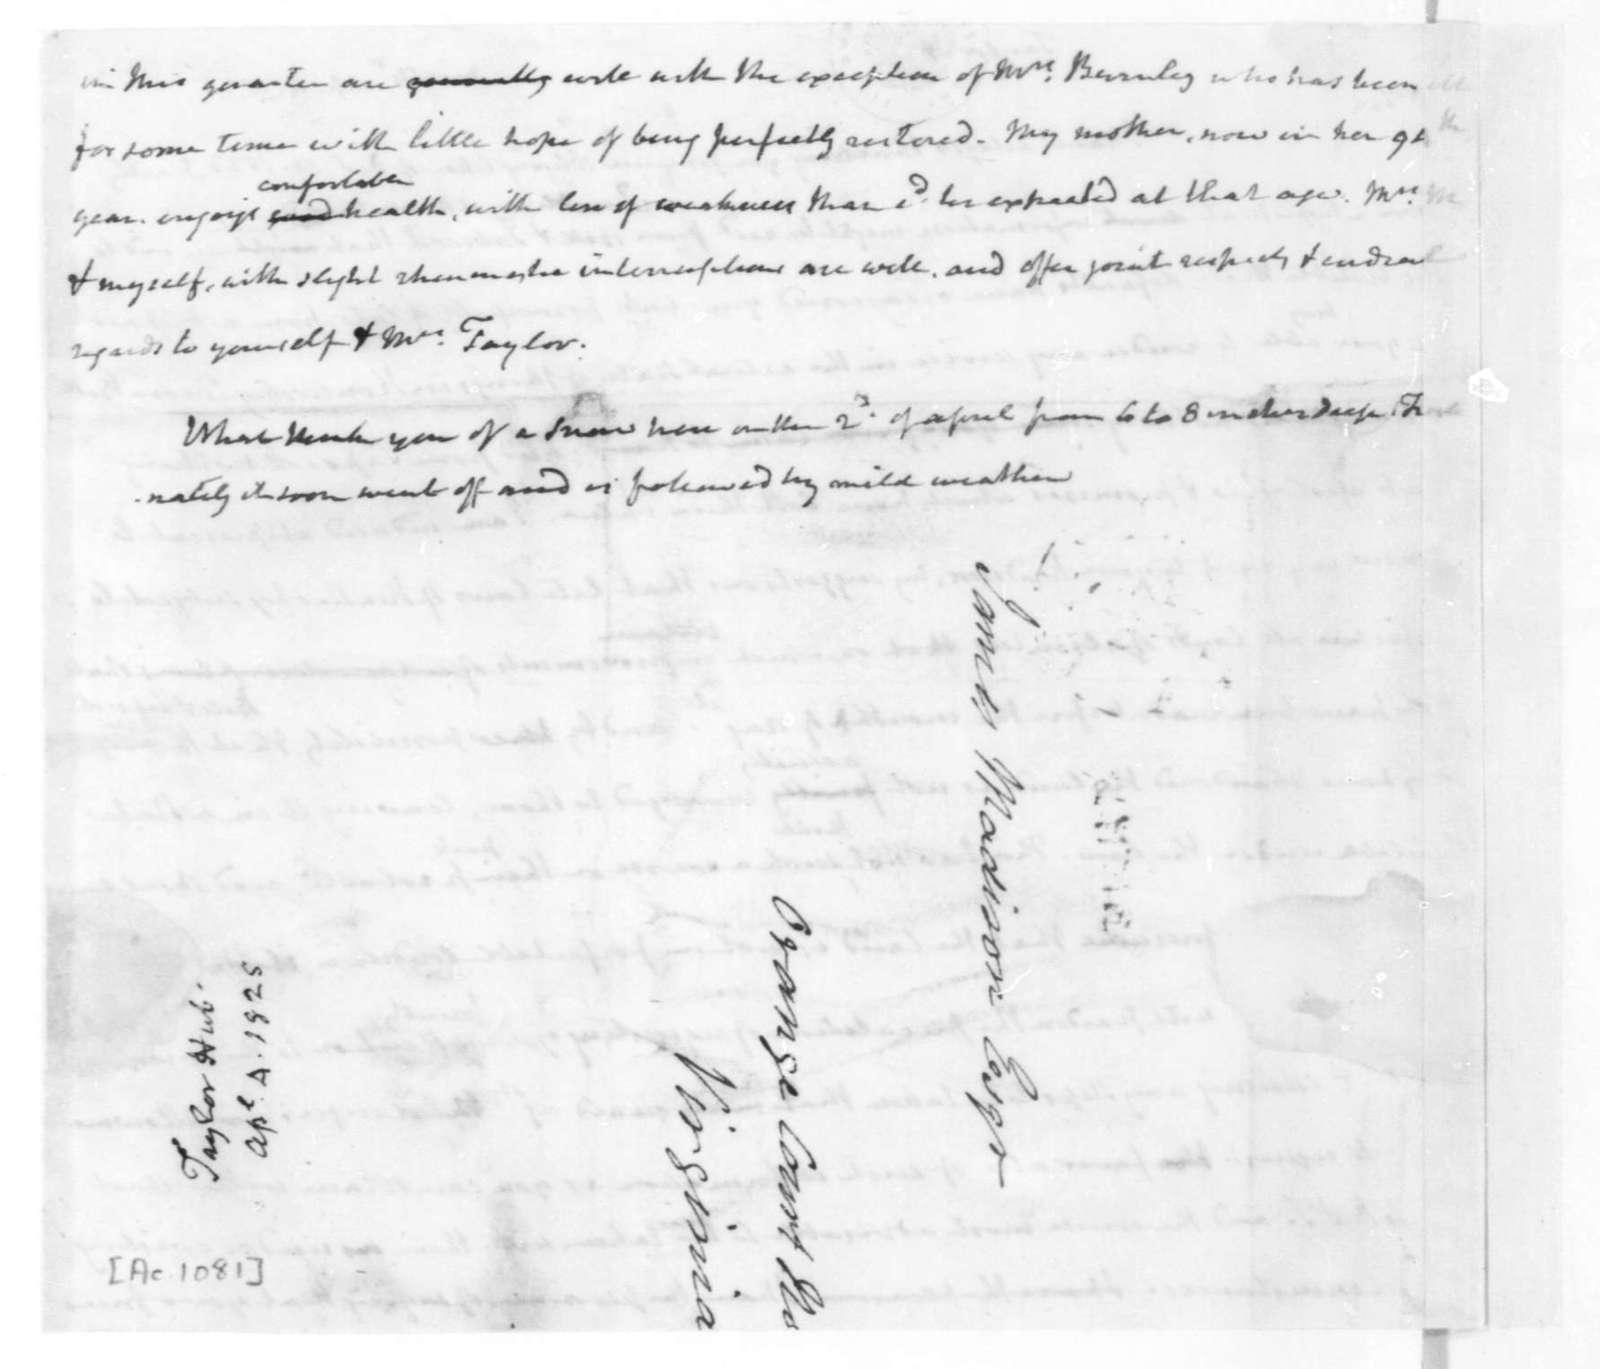 James Madison to Hubbard Taylor, April 4, 1825.